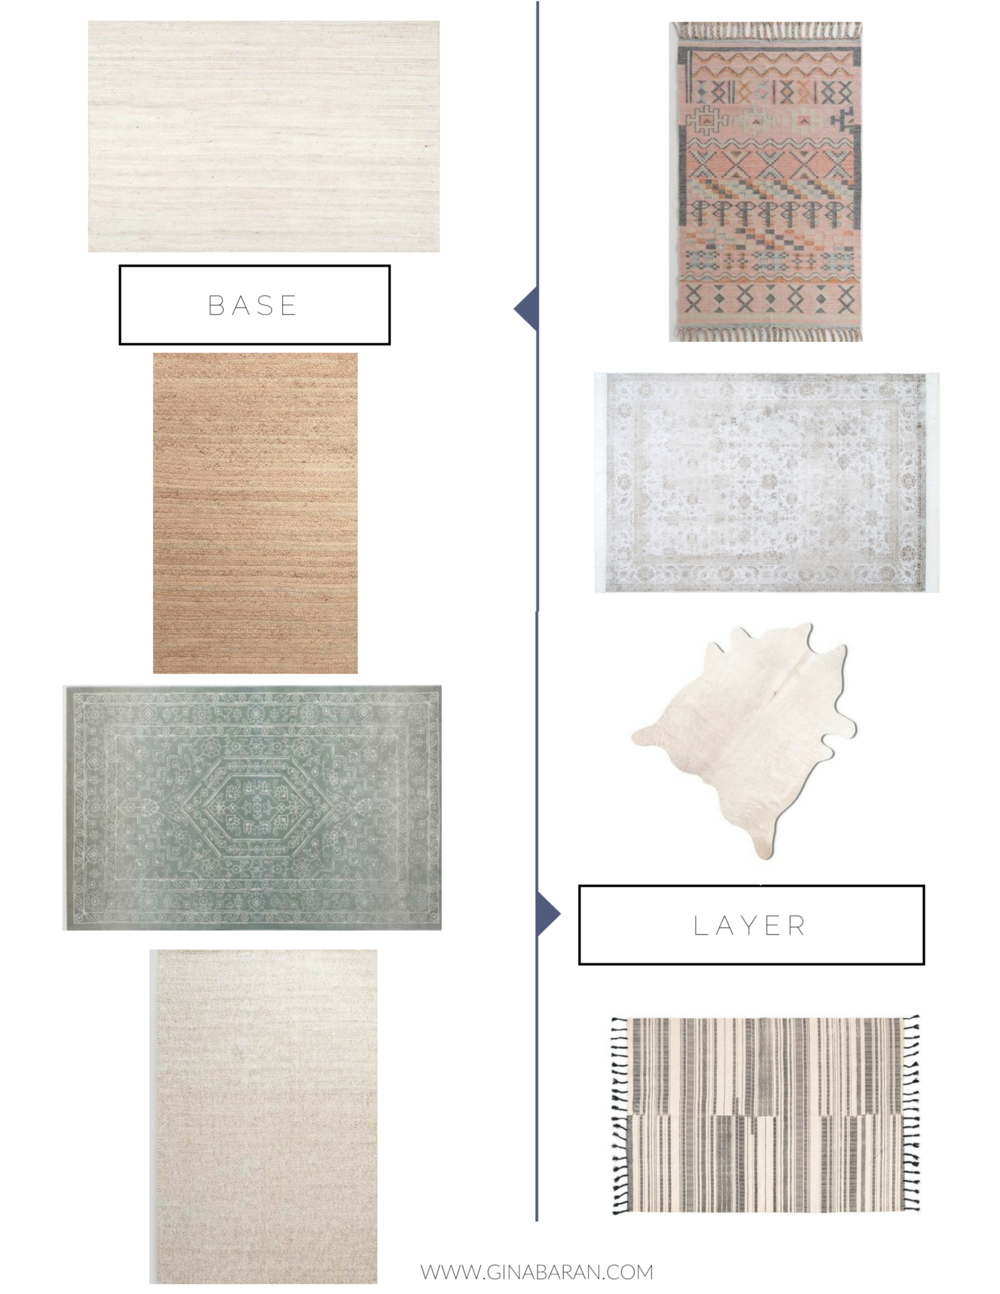 Rug Layering Interior Design Gina Baran HGTV Amber Interiors